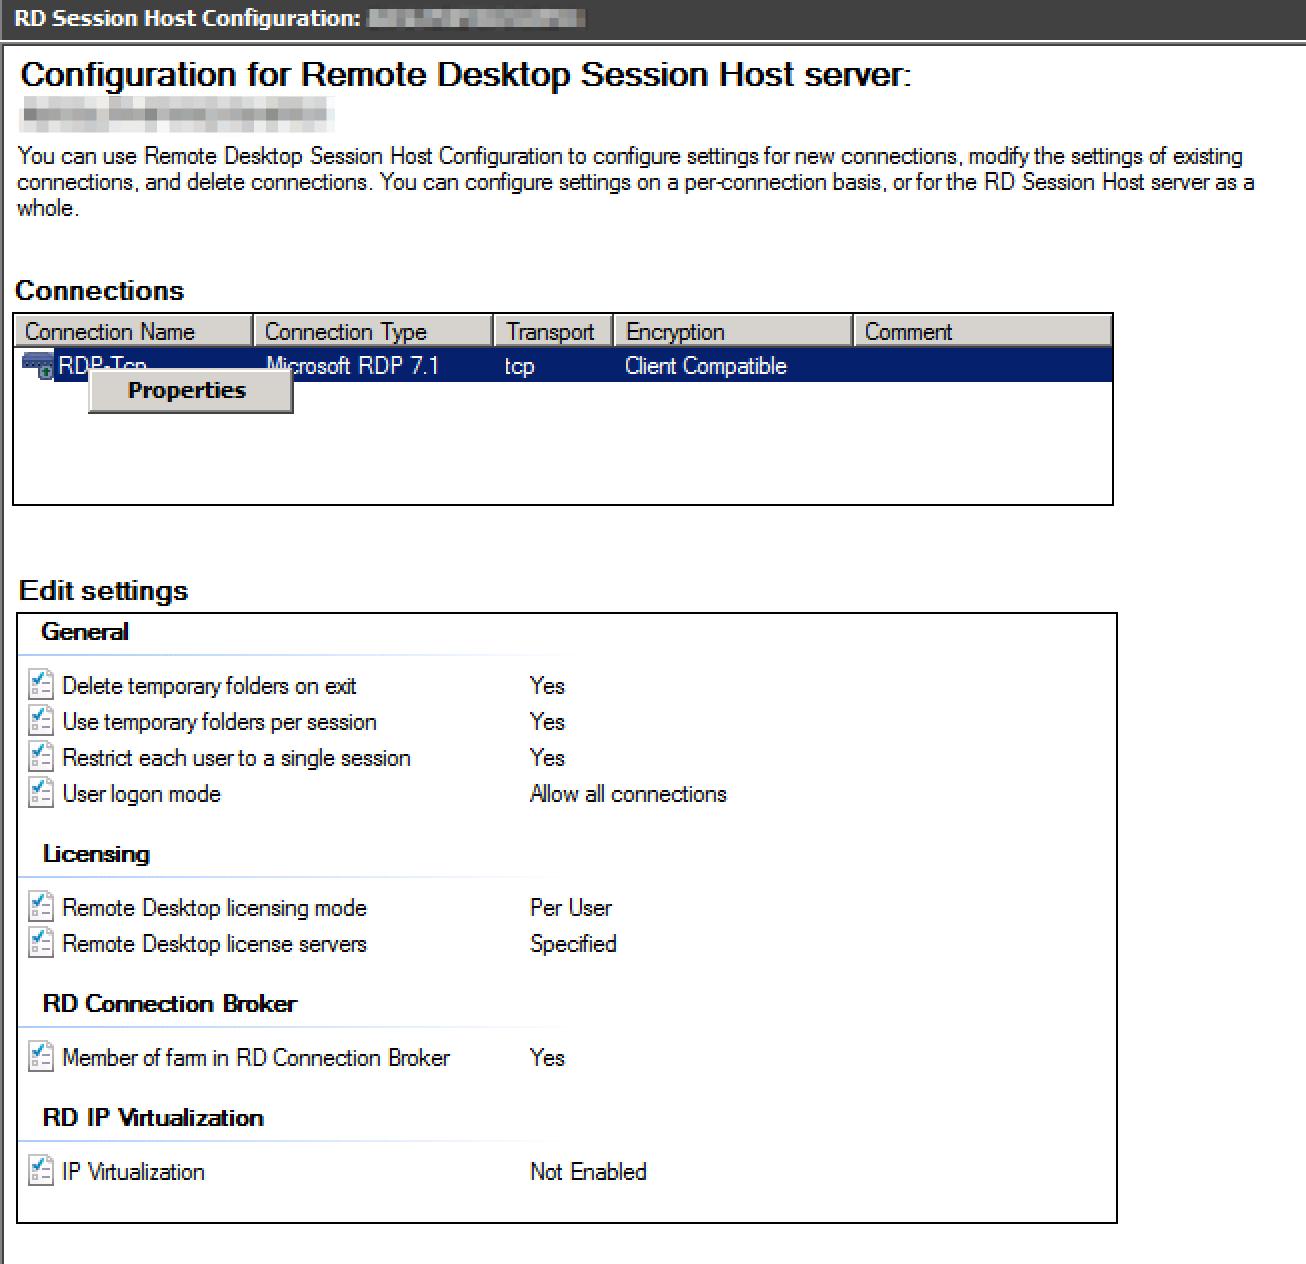 Remote Desktop Session Host Certificate | jasonboeshart com